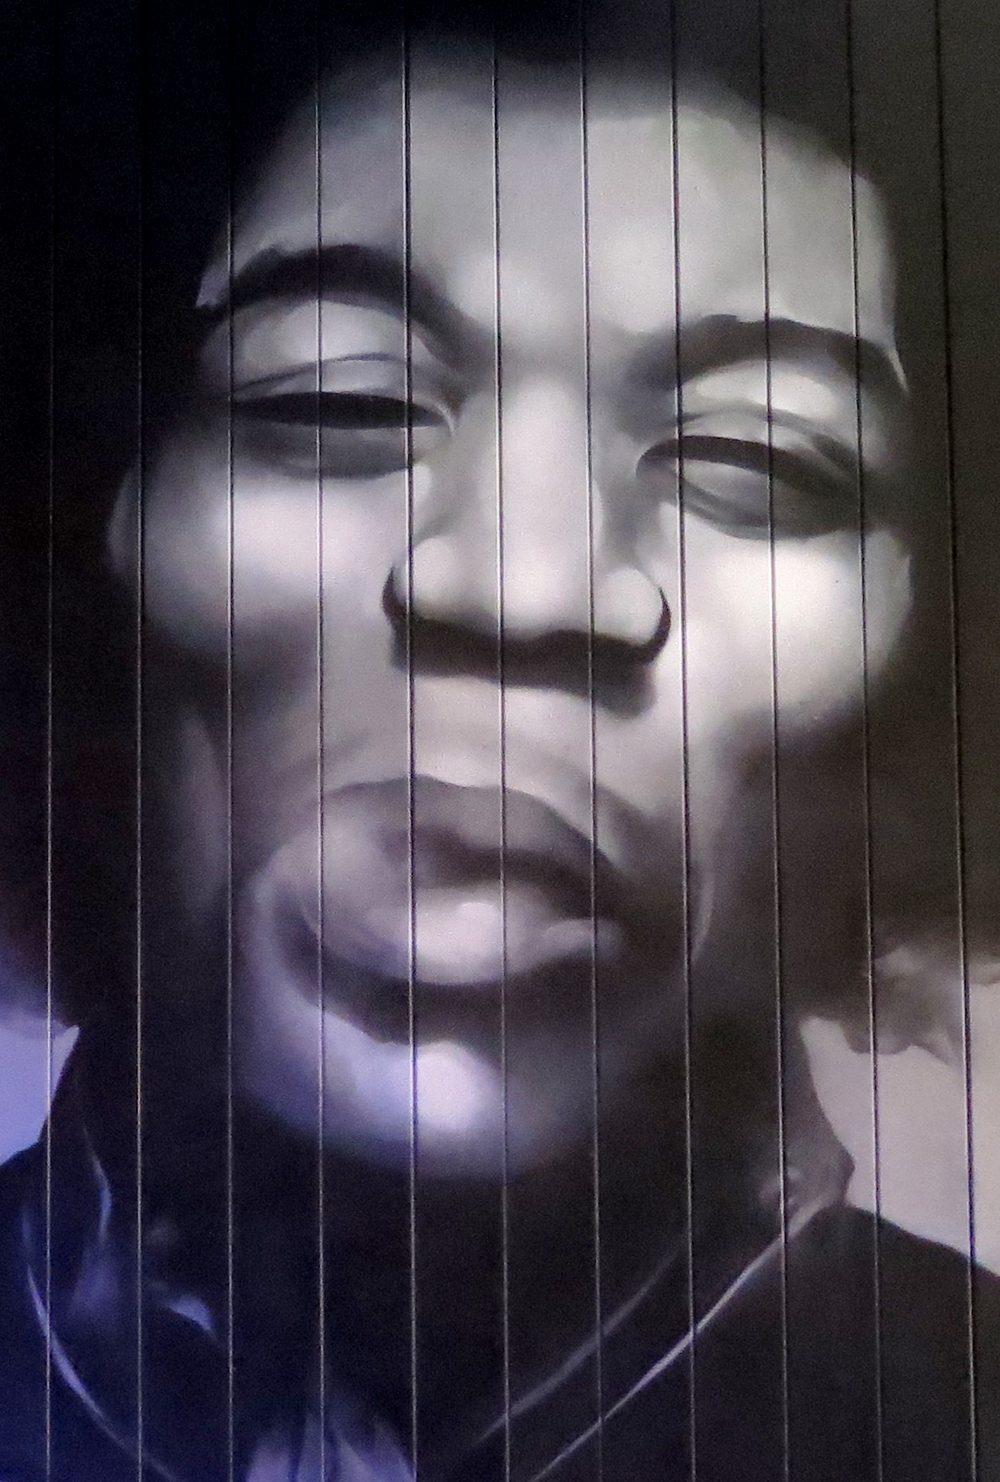 purplehaze-jimi-hendrix-graffiti-art-mural-rmer-2